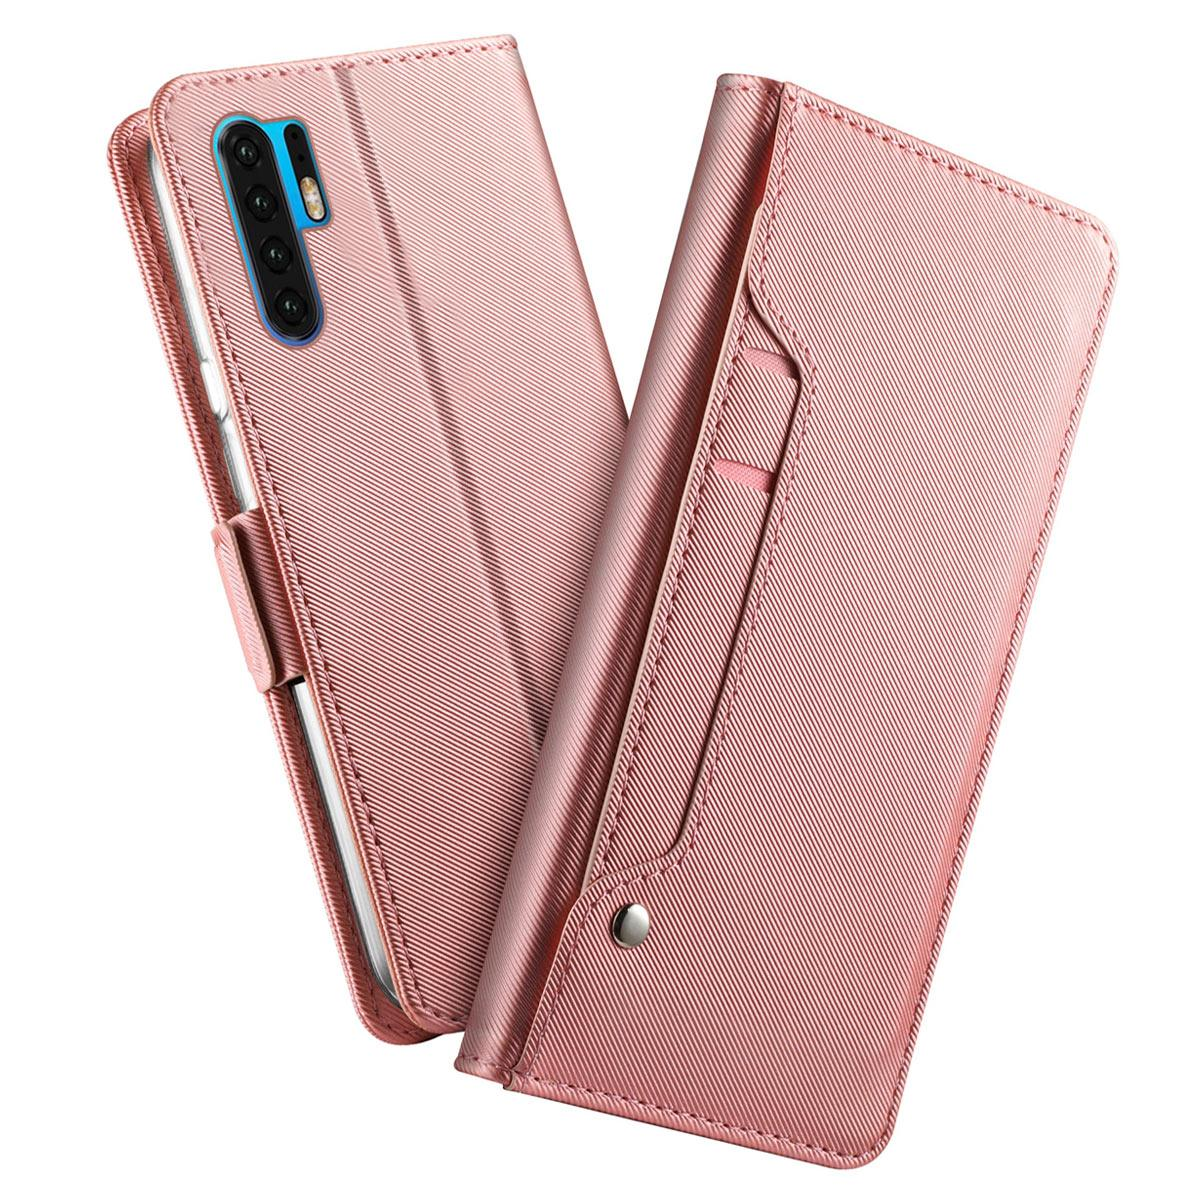 Plånboksfodral Spegel Huawei P30 Pro Rosa Guld